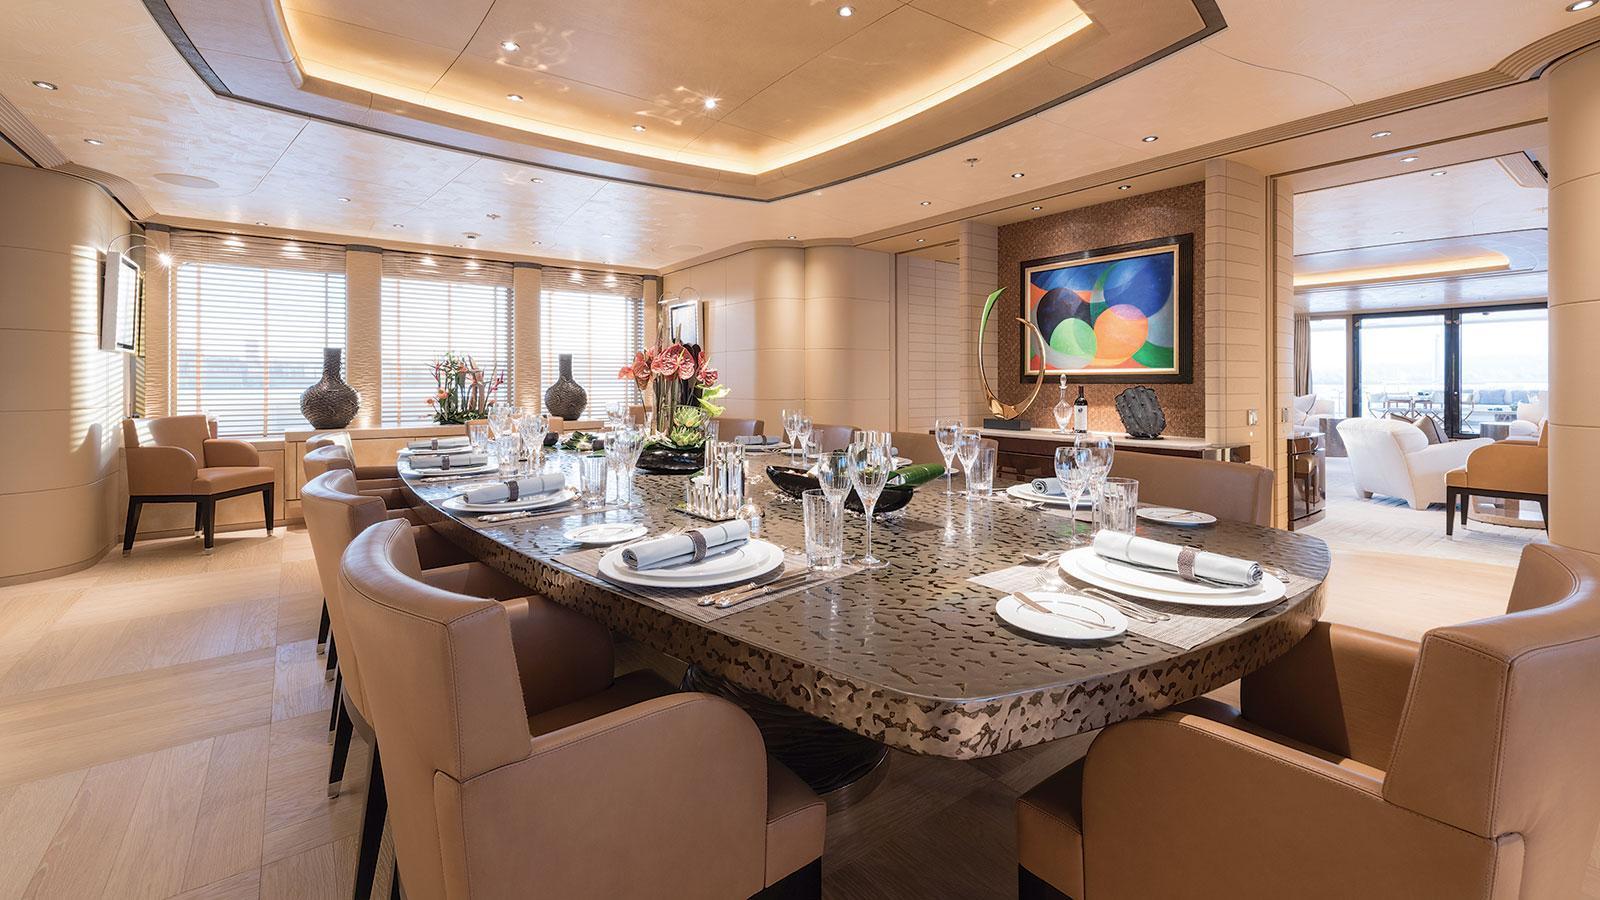 romea-motor-yacht-abeking-rasmussen-2015-82m-dining-room